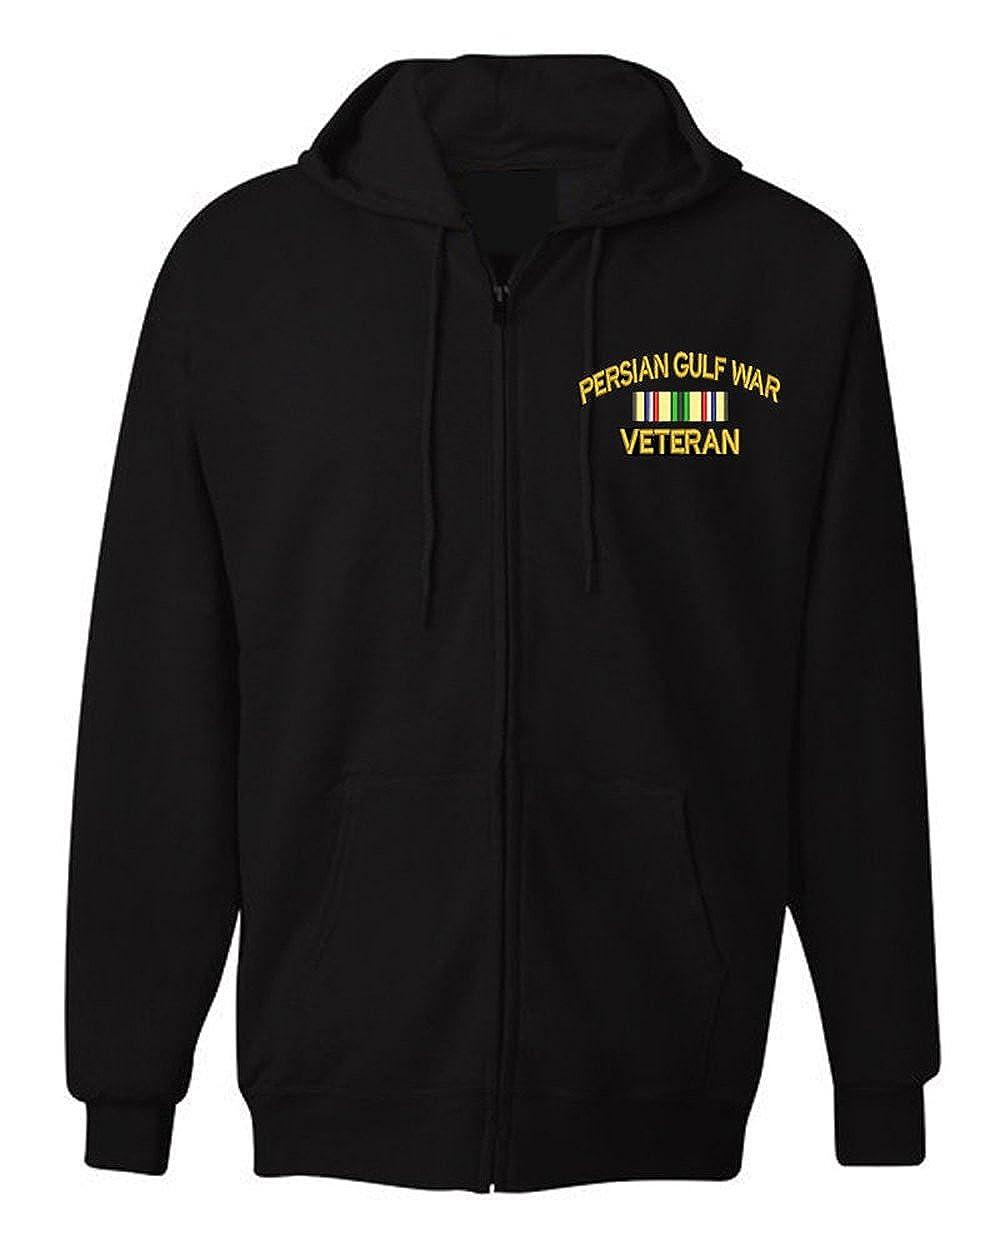 Koopa American Law Enforcement Military Persian Gulf WAR Veteran Jacket Zipper Hoodie-4XL